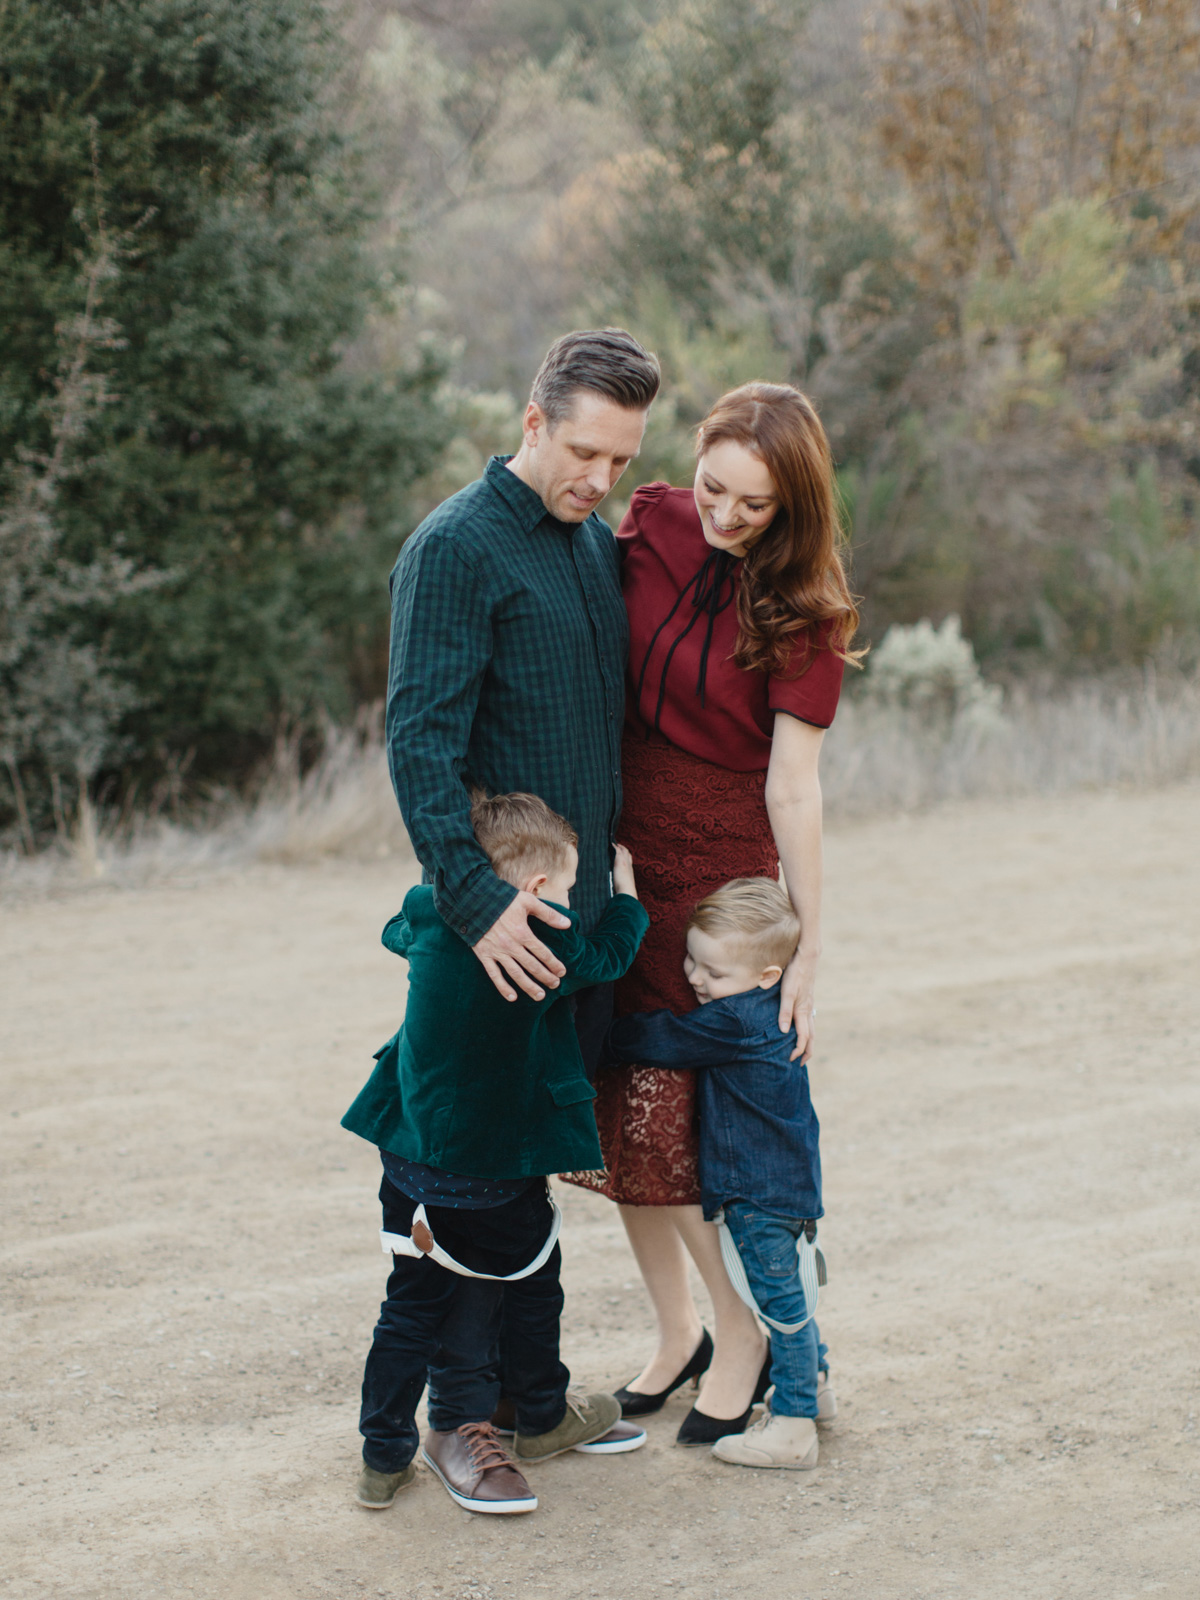 Los Angeles Family Photographer - Belessa Family-001.jpg